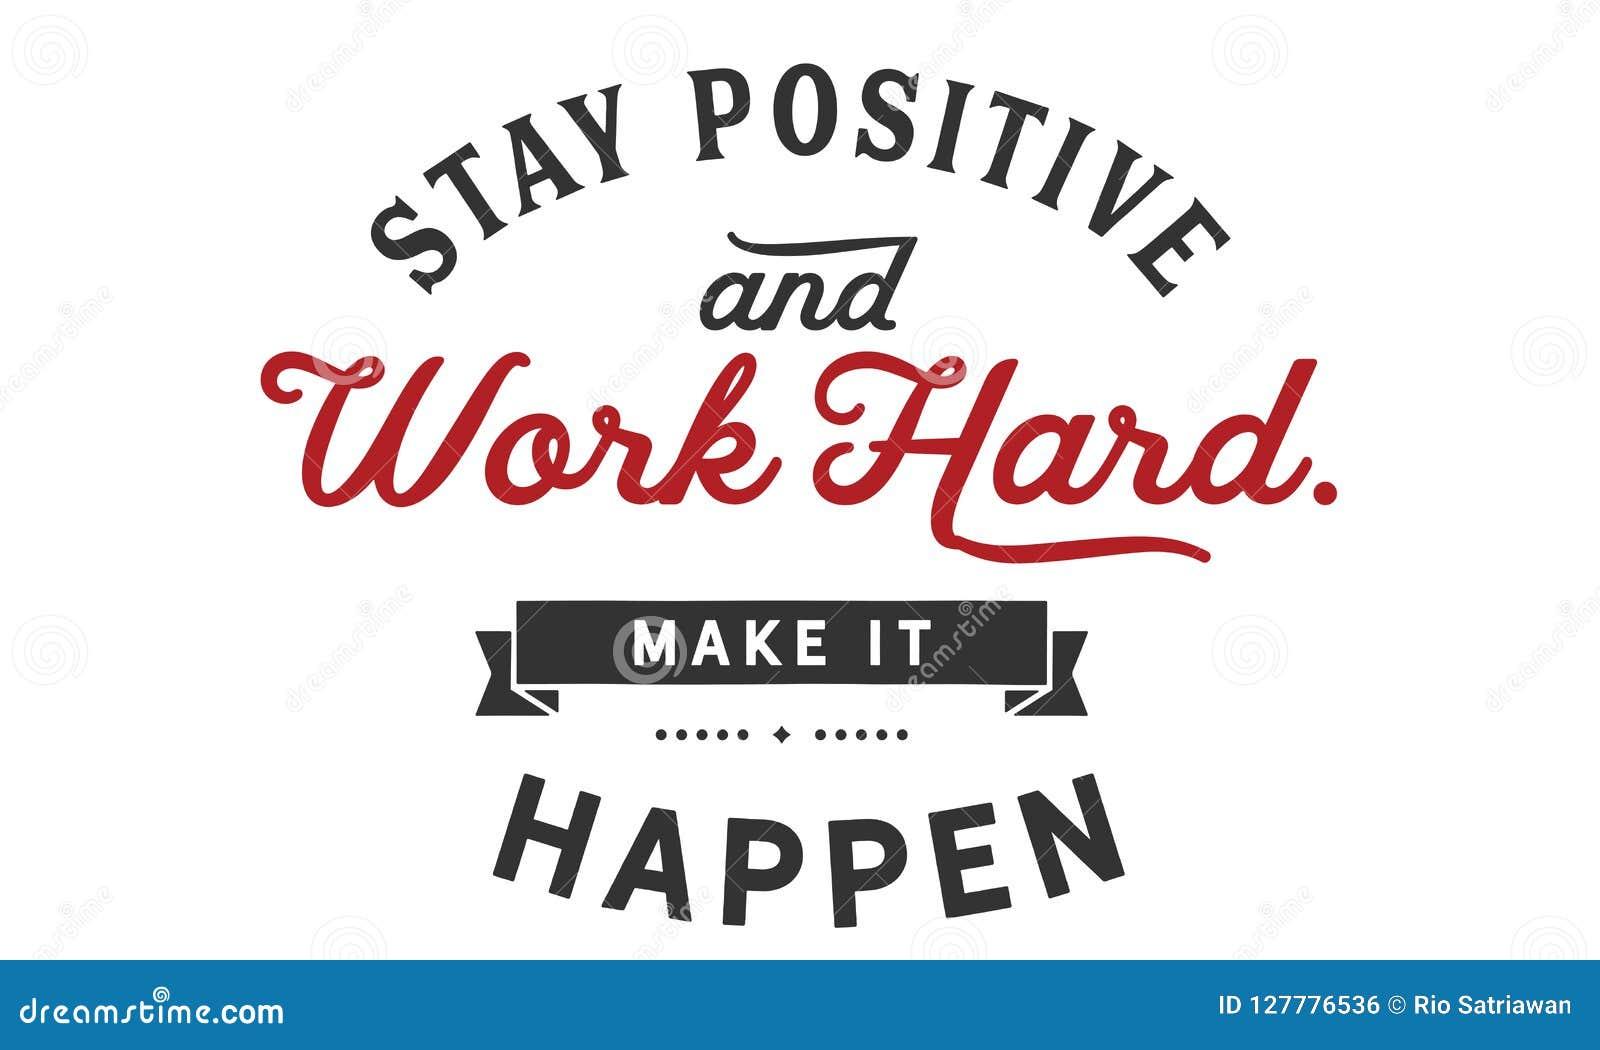 Make It Happen >> Stay Positive And Work Hard Make It Happen Stock Vector